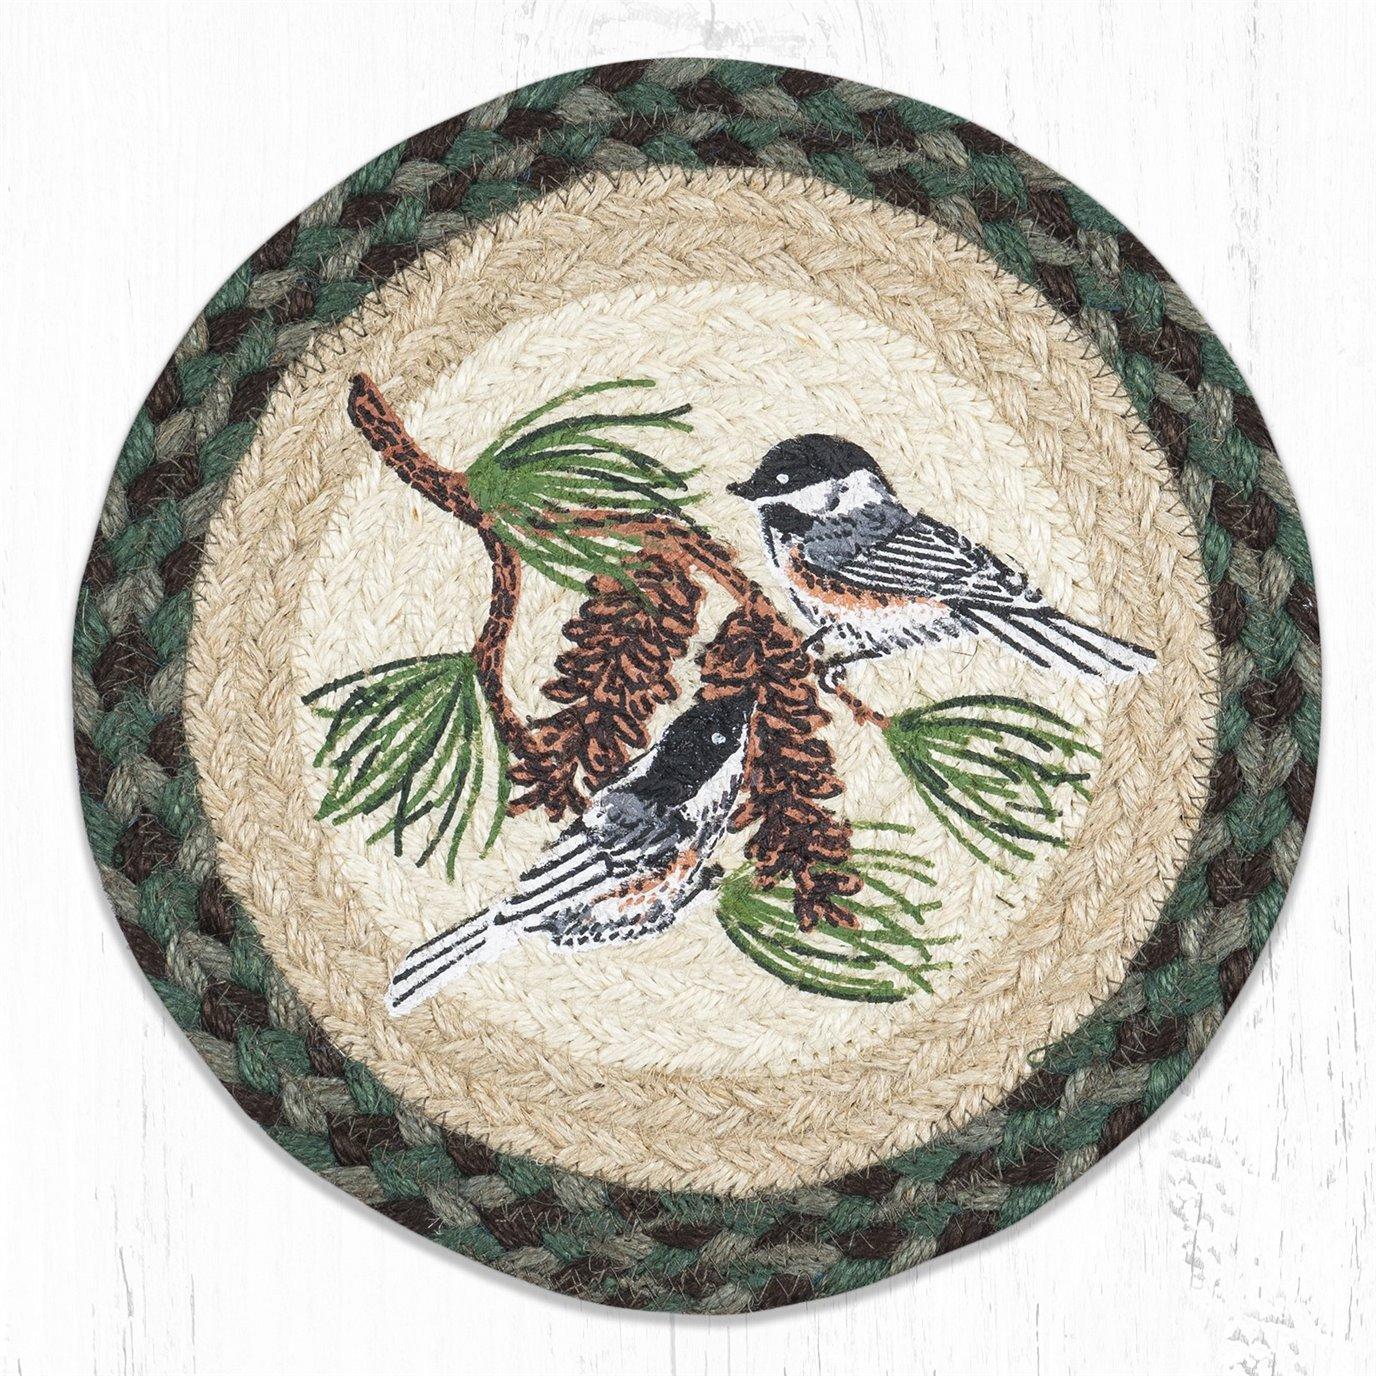 "Chickadee Pinecone Printed Round Braided Trivet 10""x10"""